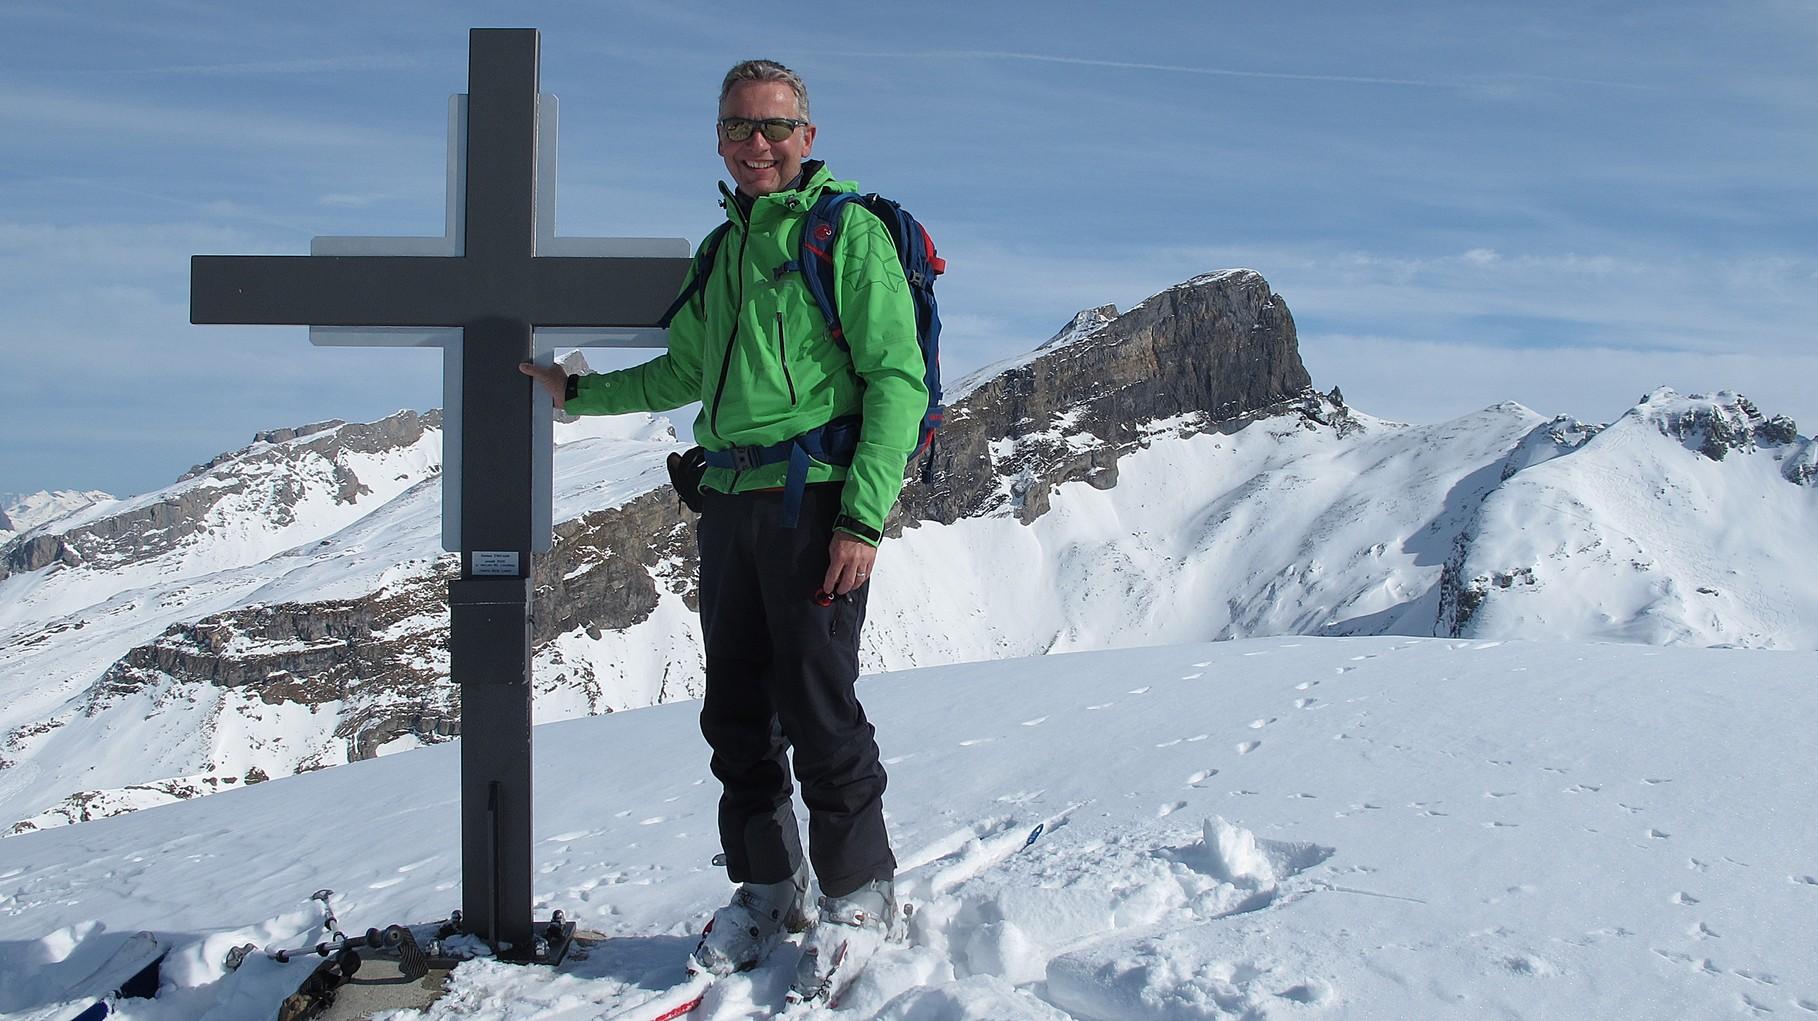 Gipfel Siwfass